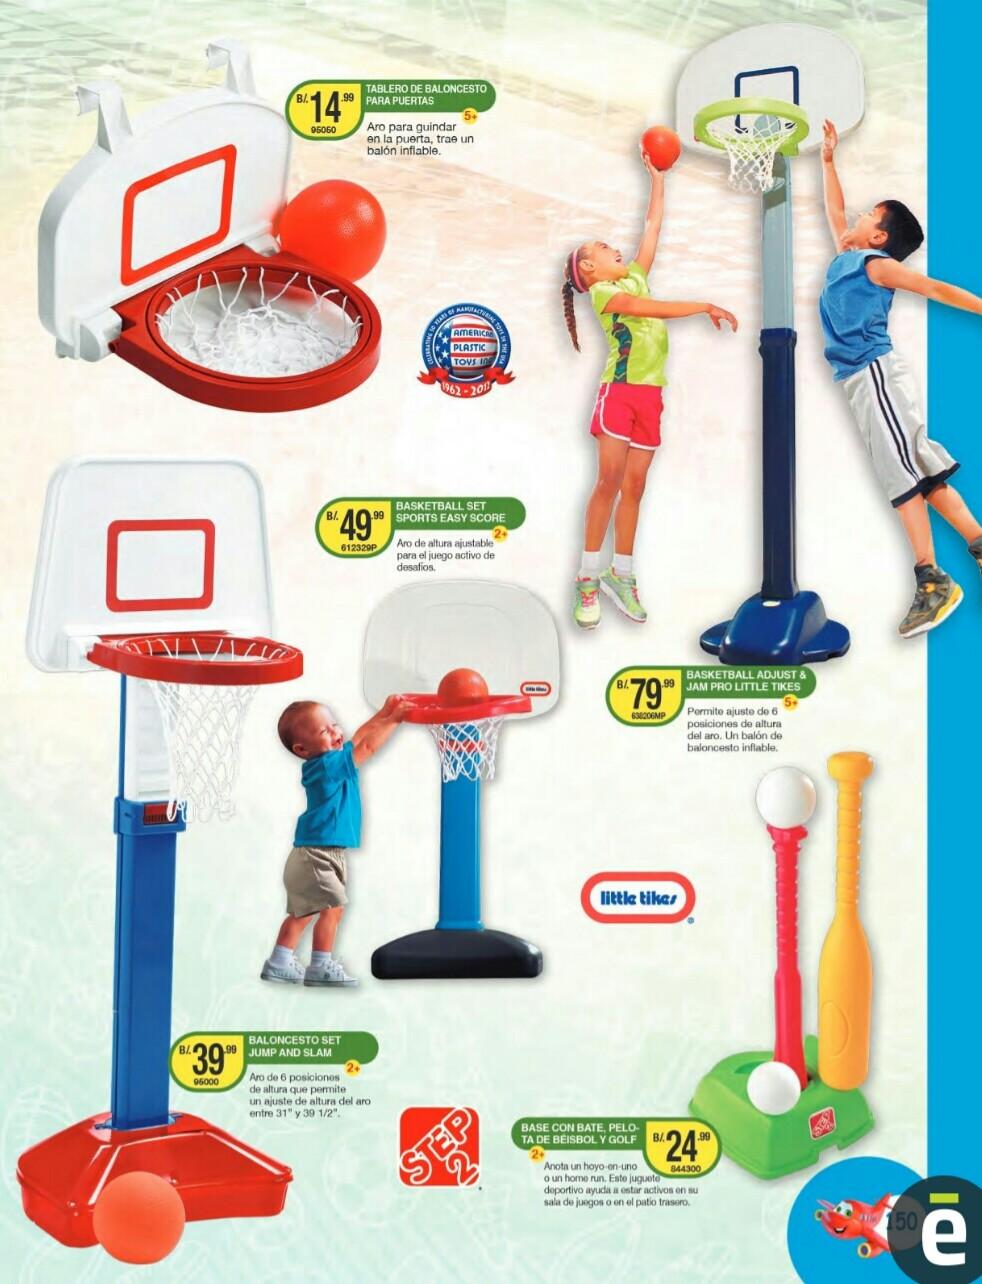 Catalogo juguetes Titan Toys 2019 p150